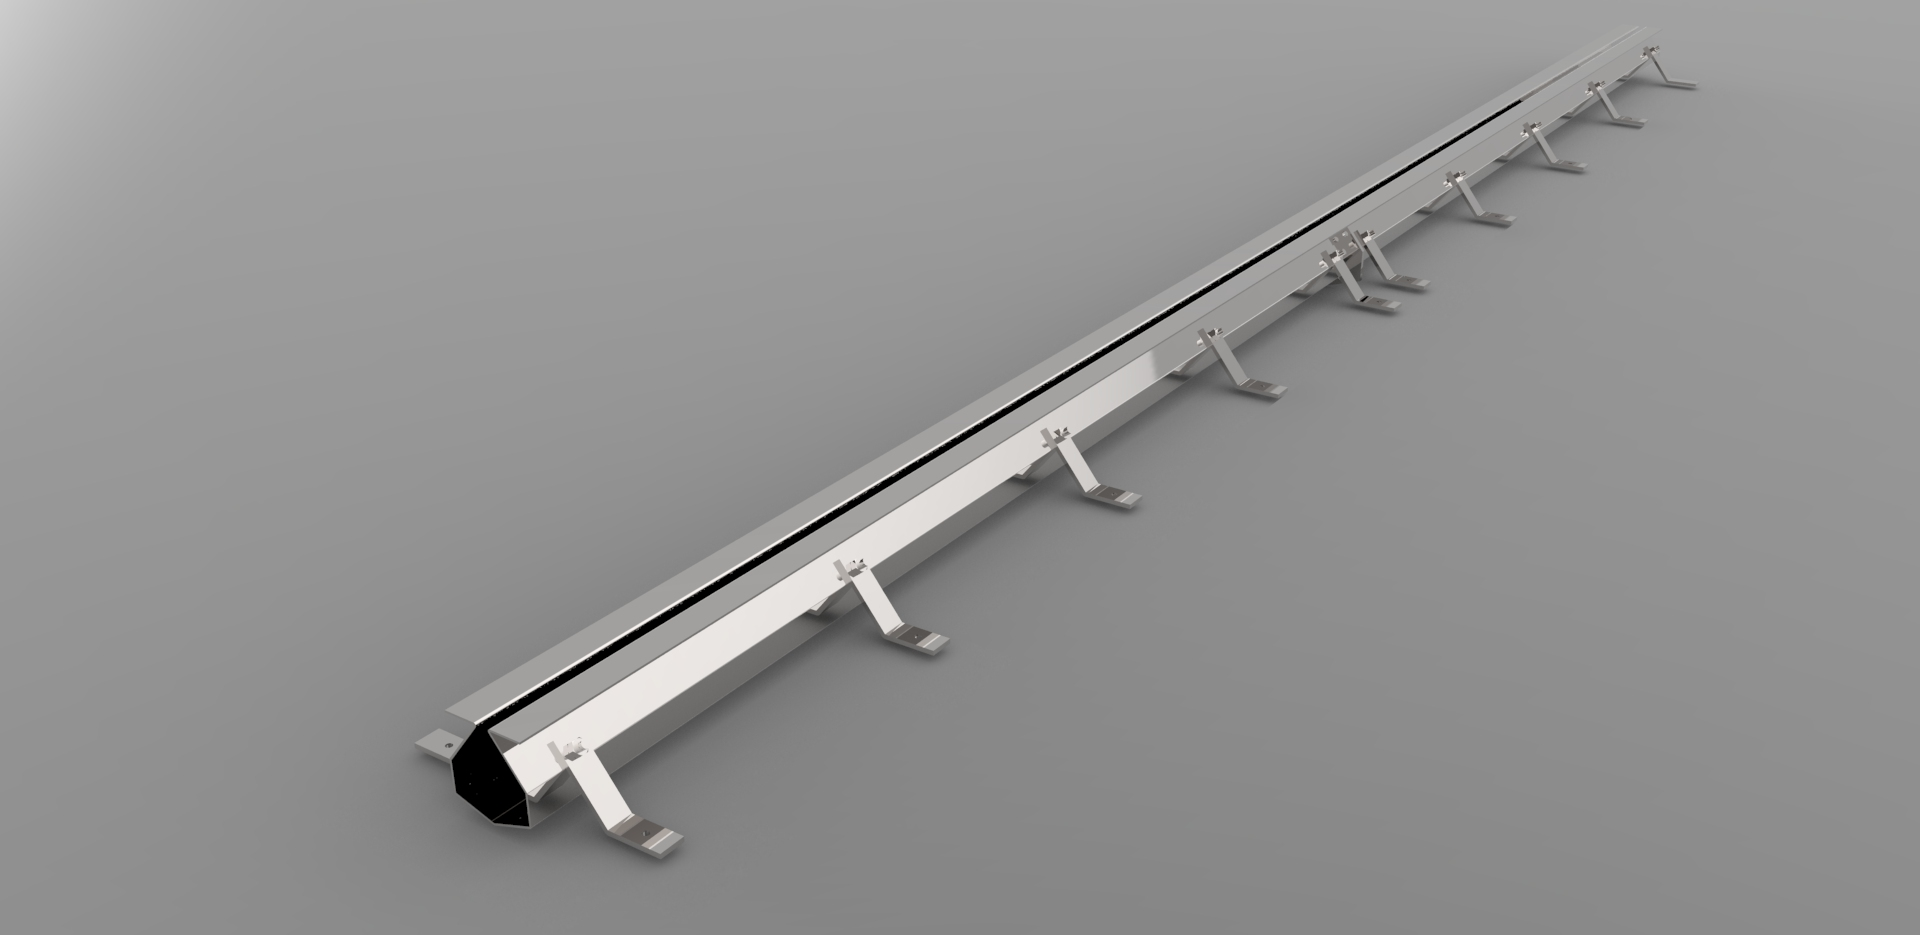 Slot Drain Shallow Profile - Beautiful Drain Designs